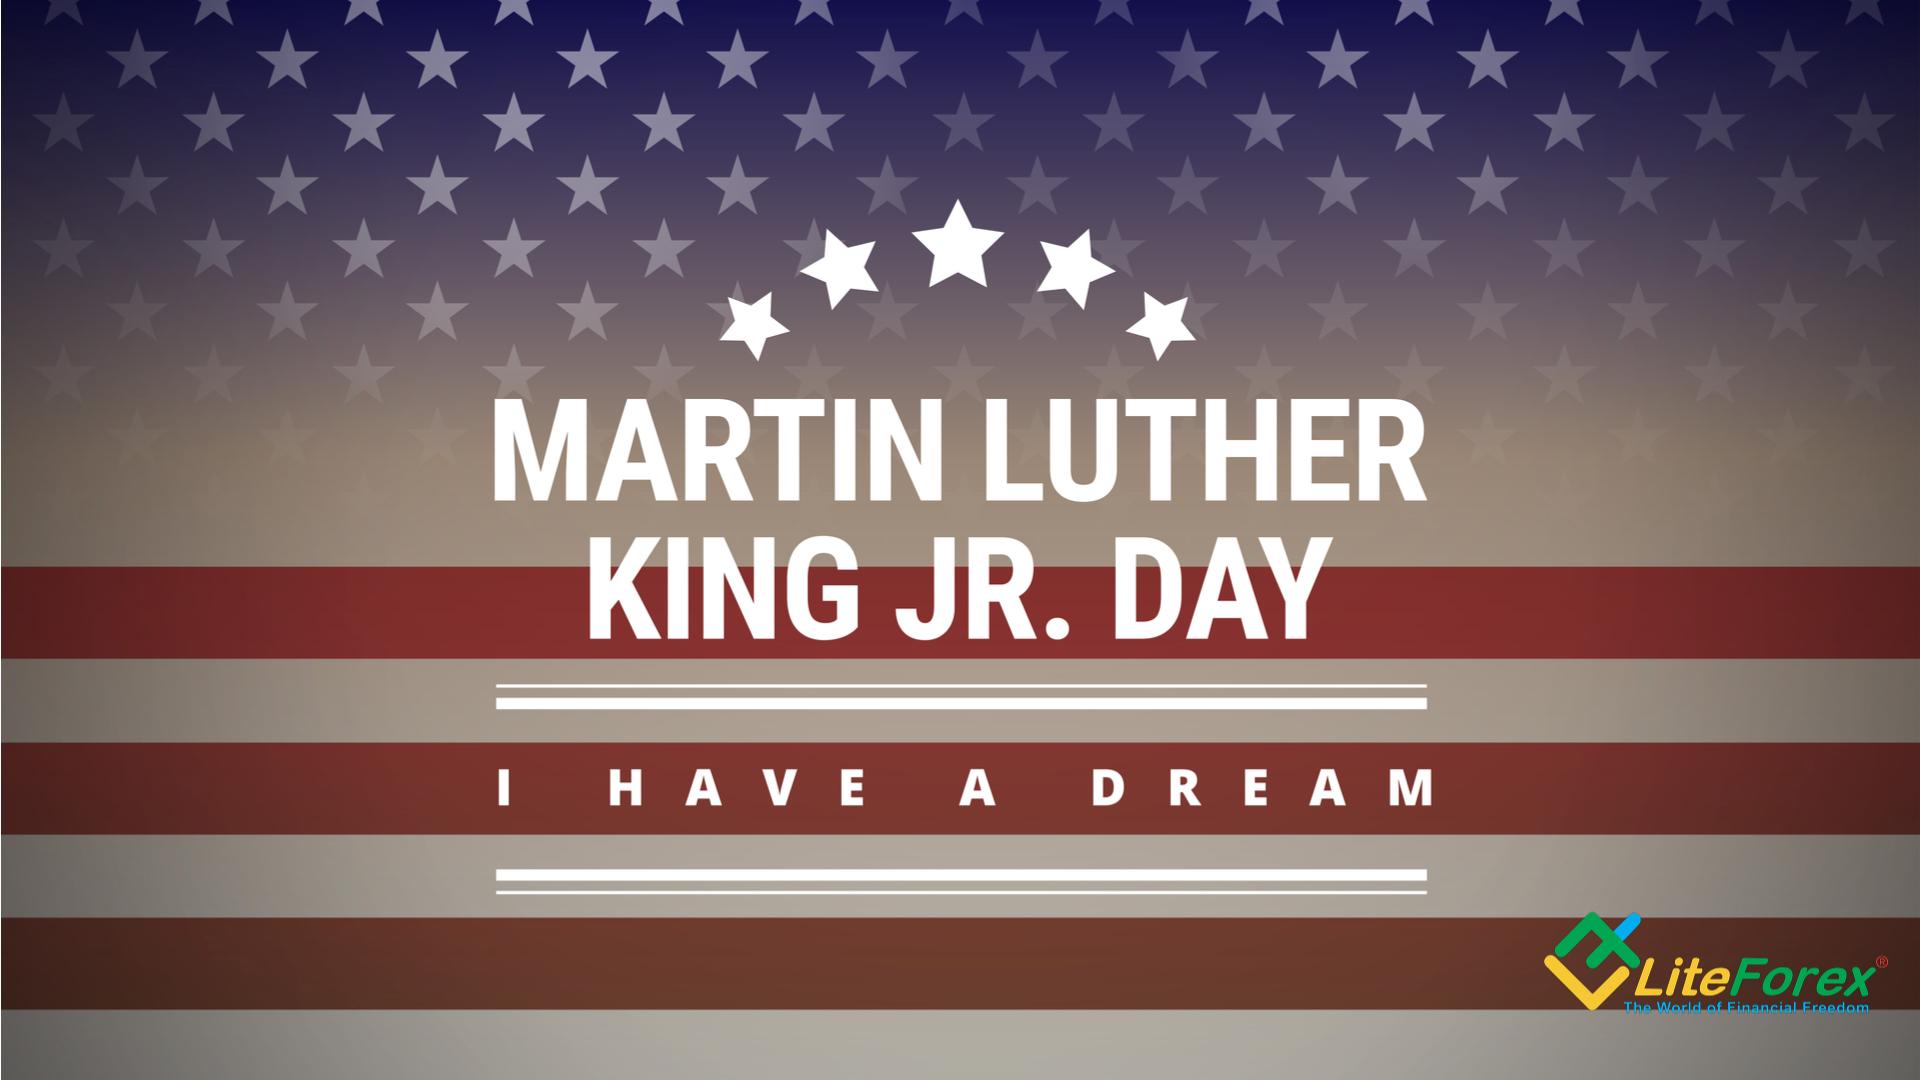 Dzień Martina Luthera Kinga w USA